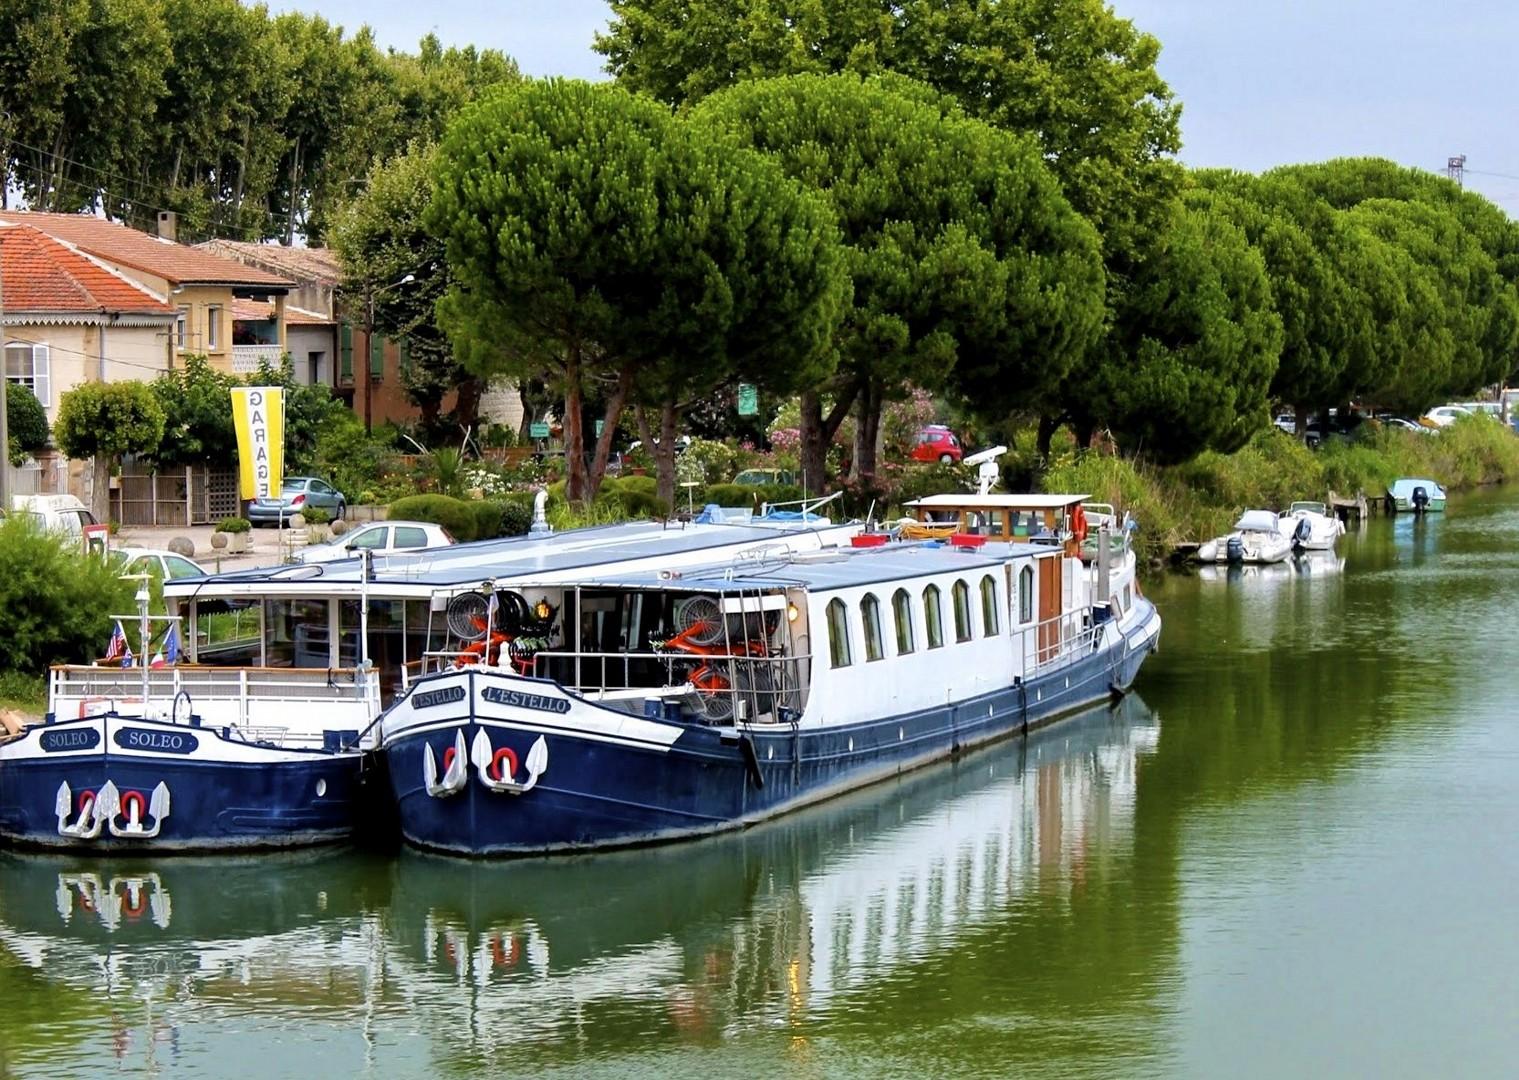 01-Estello e Soleo ad Aigues Mortes.jpg - France - Provence - Avignon to Aigues-Mortes - Bike and Barge Holiday - Leisure Cycling